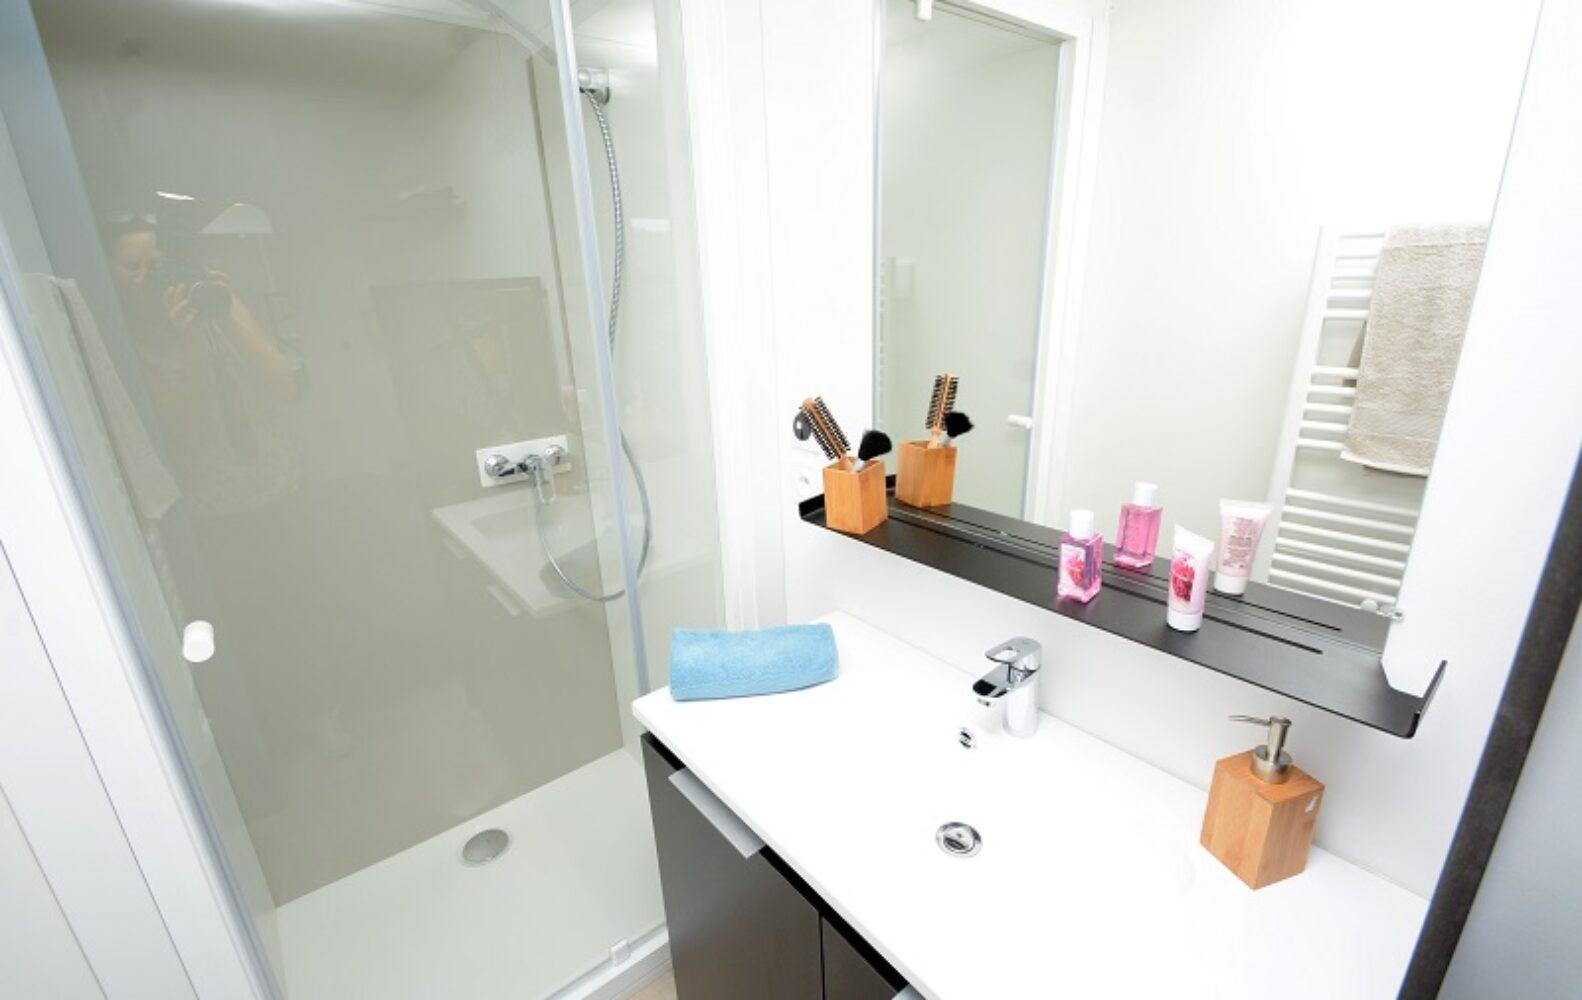 OASIS-salle-de-bain-5-Camp-du-Domaine